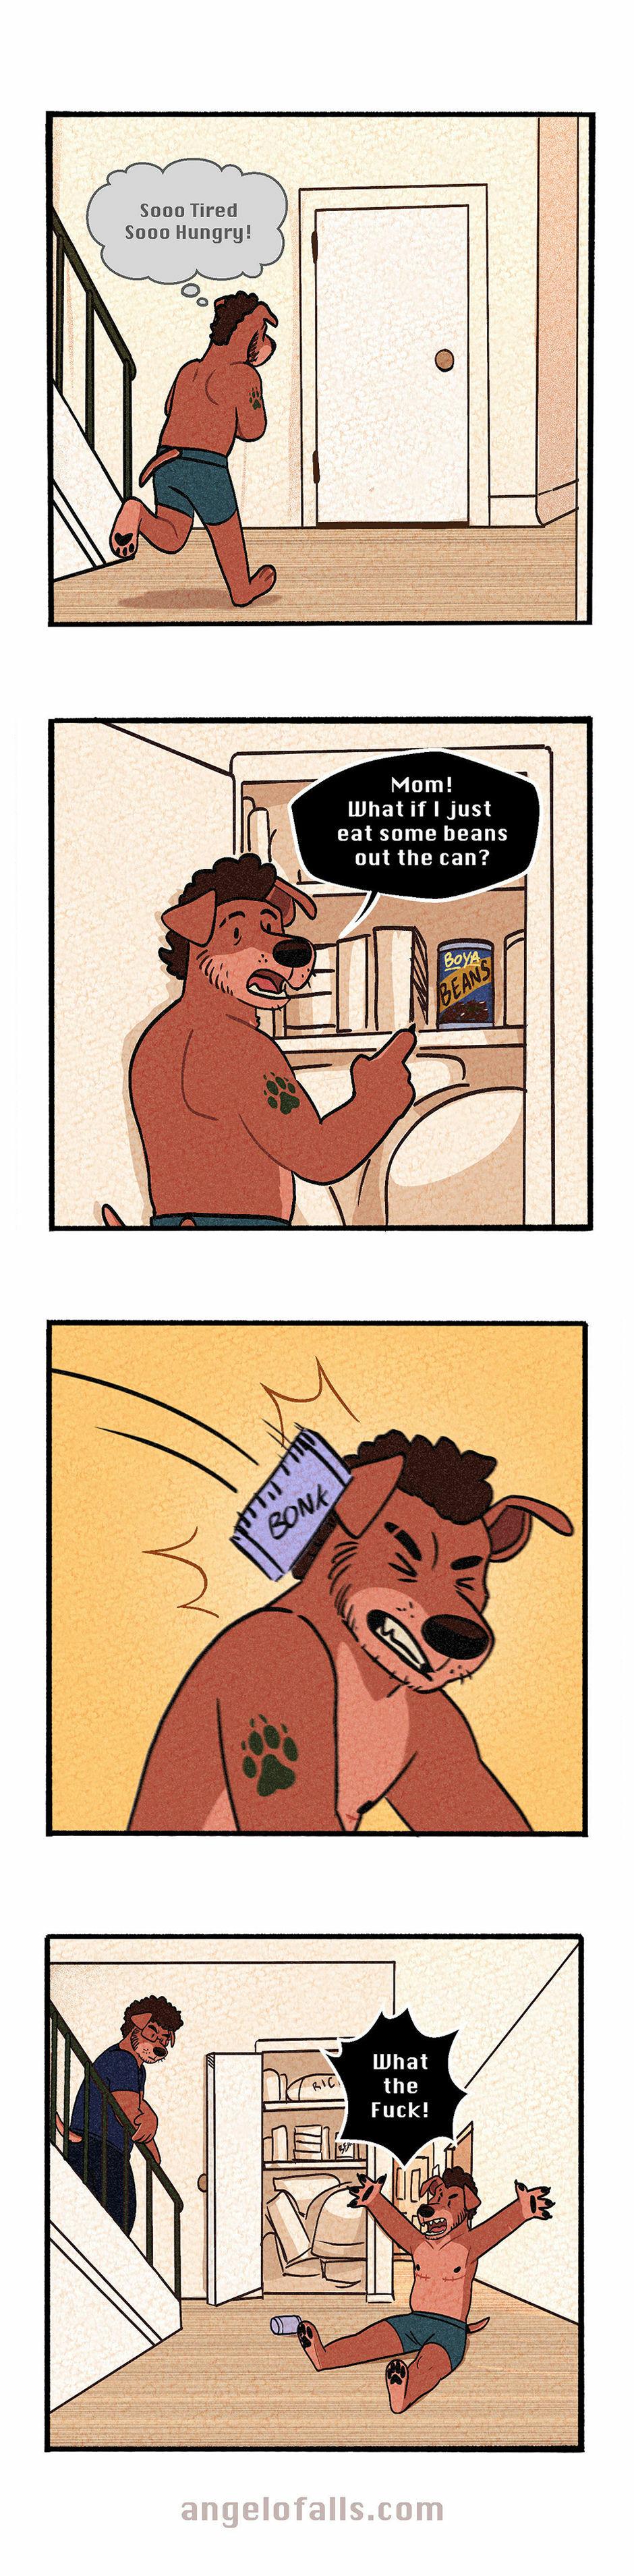 Beans (comic)